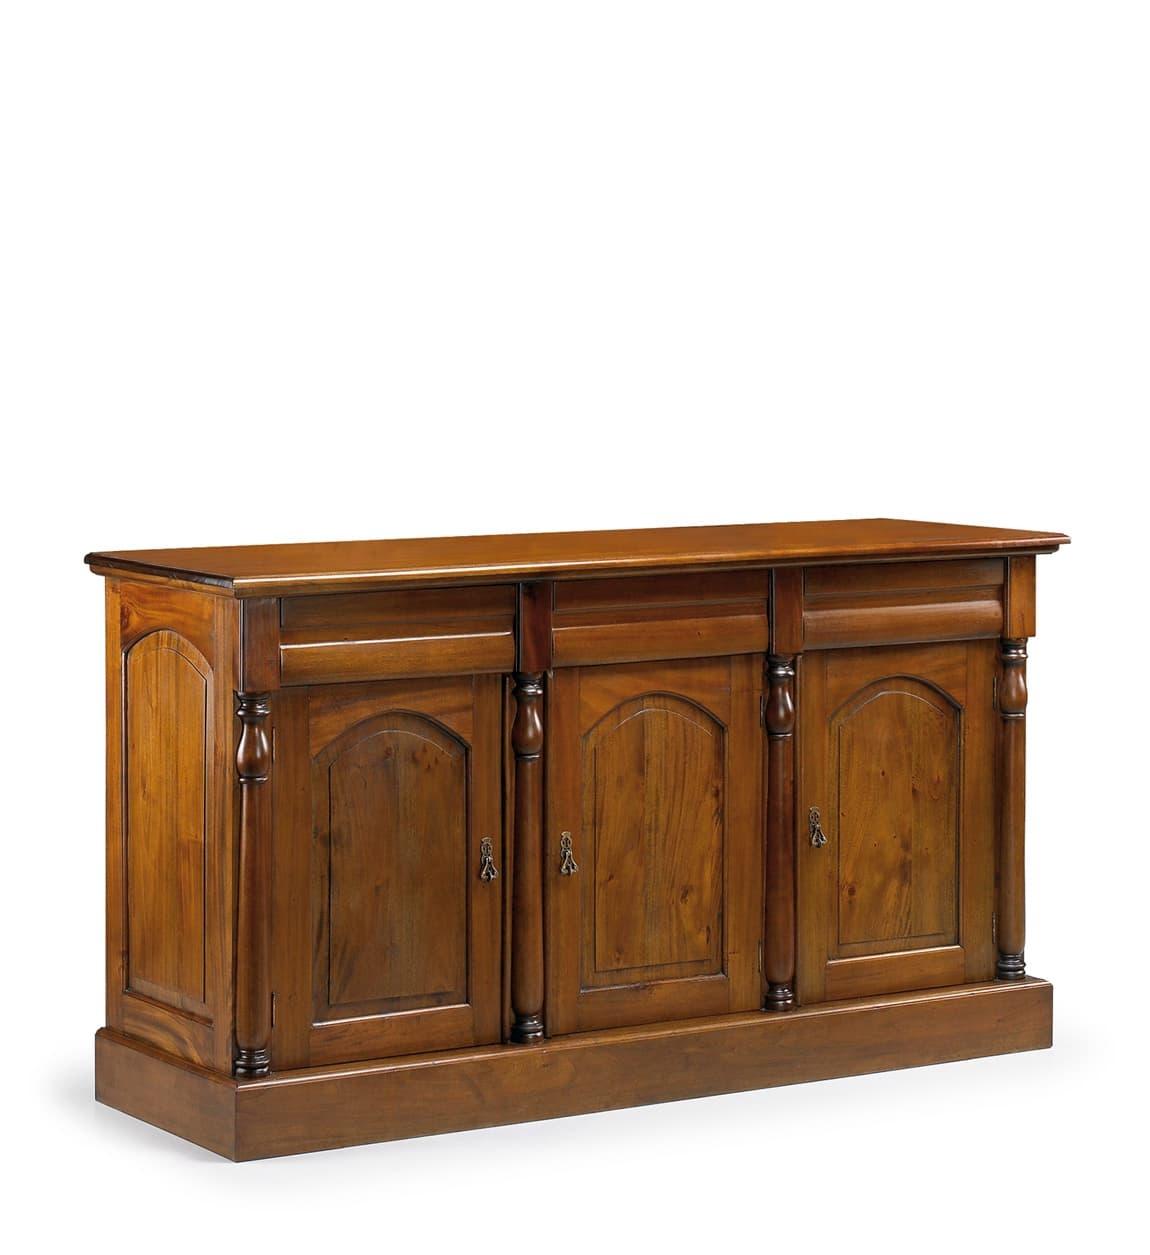 Comoda din lemn cu 3 sertare si 3 usi, Vintage Nuc, l170xA50xH95 cm somproduct.ro